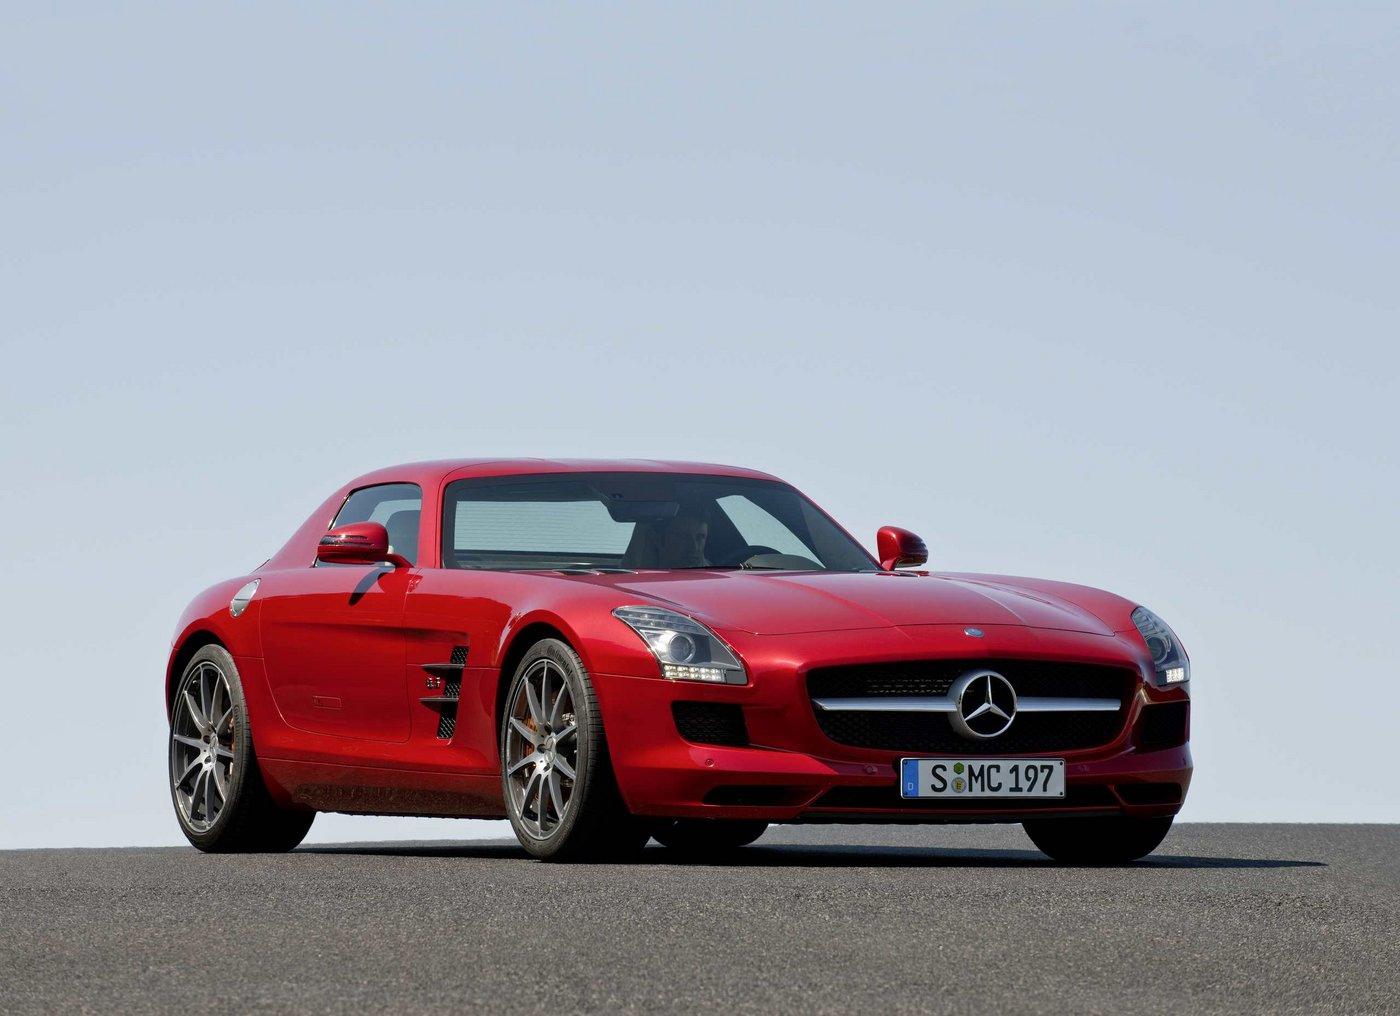 2010 mercedes benz sls amg images leaked for Mercedes benz sls amg cost